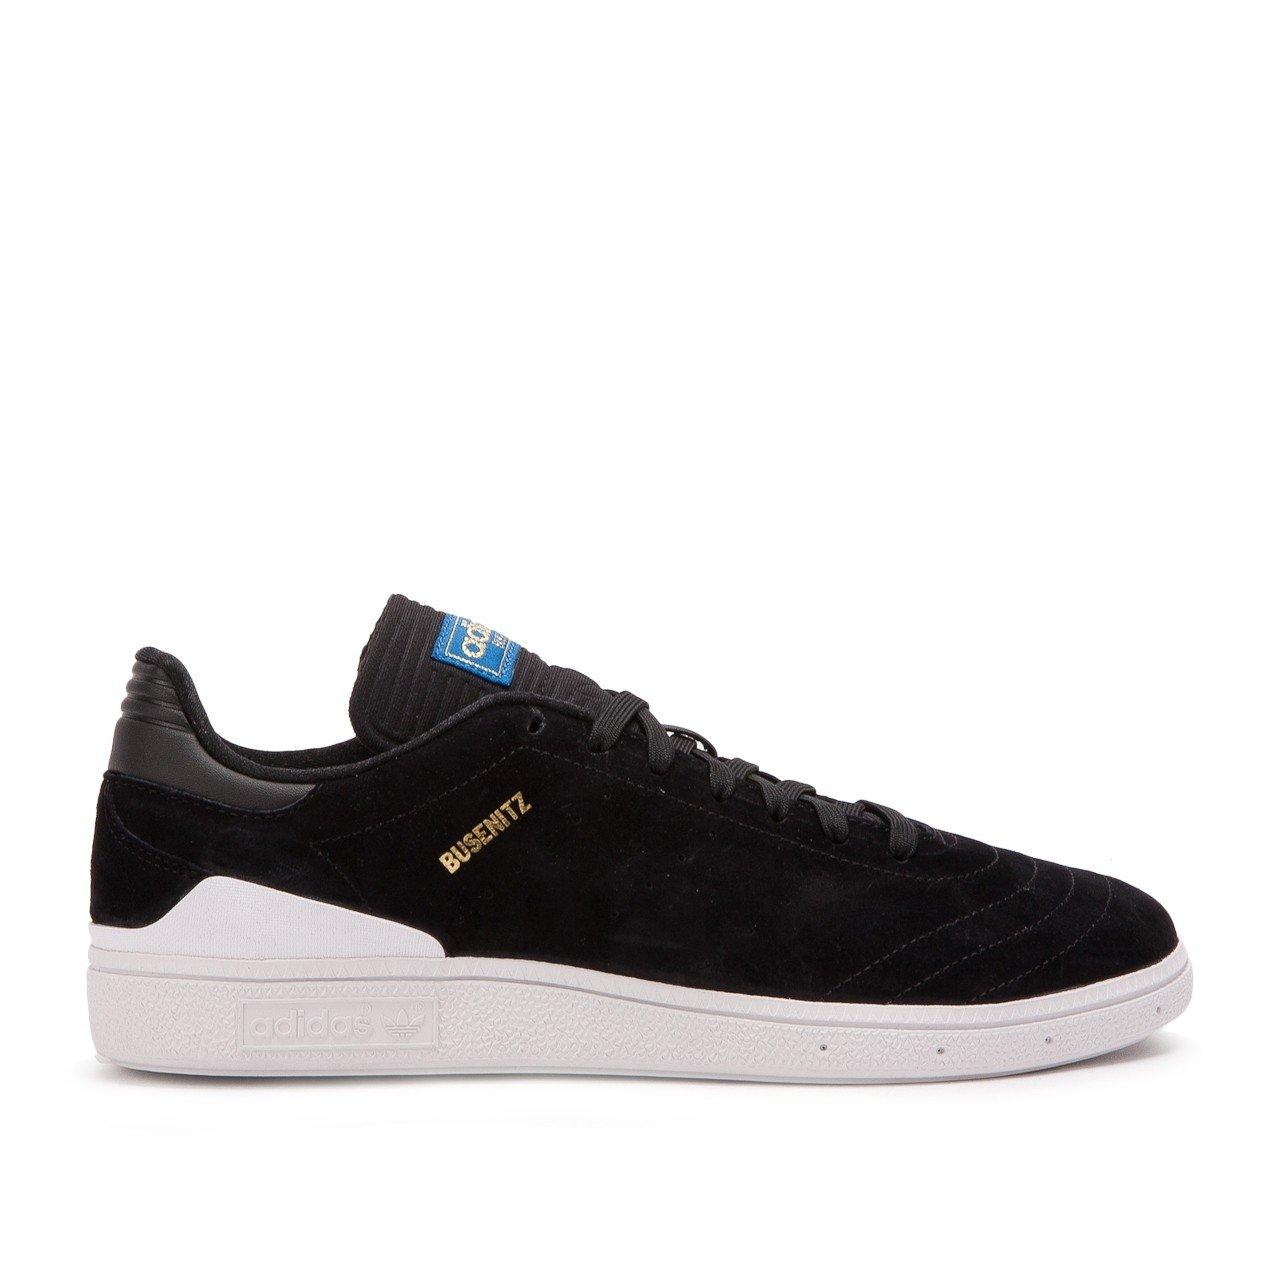 adidas Originals Men's Superstar Vulc Adv Shoes B076JM57XH 6 D(M) US|Cblack,ftwwht,blubir